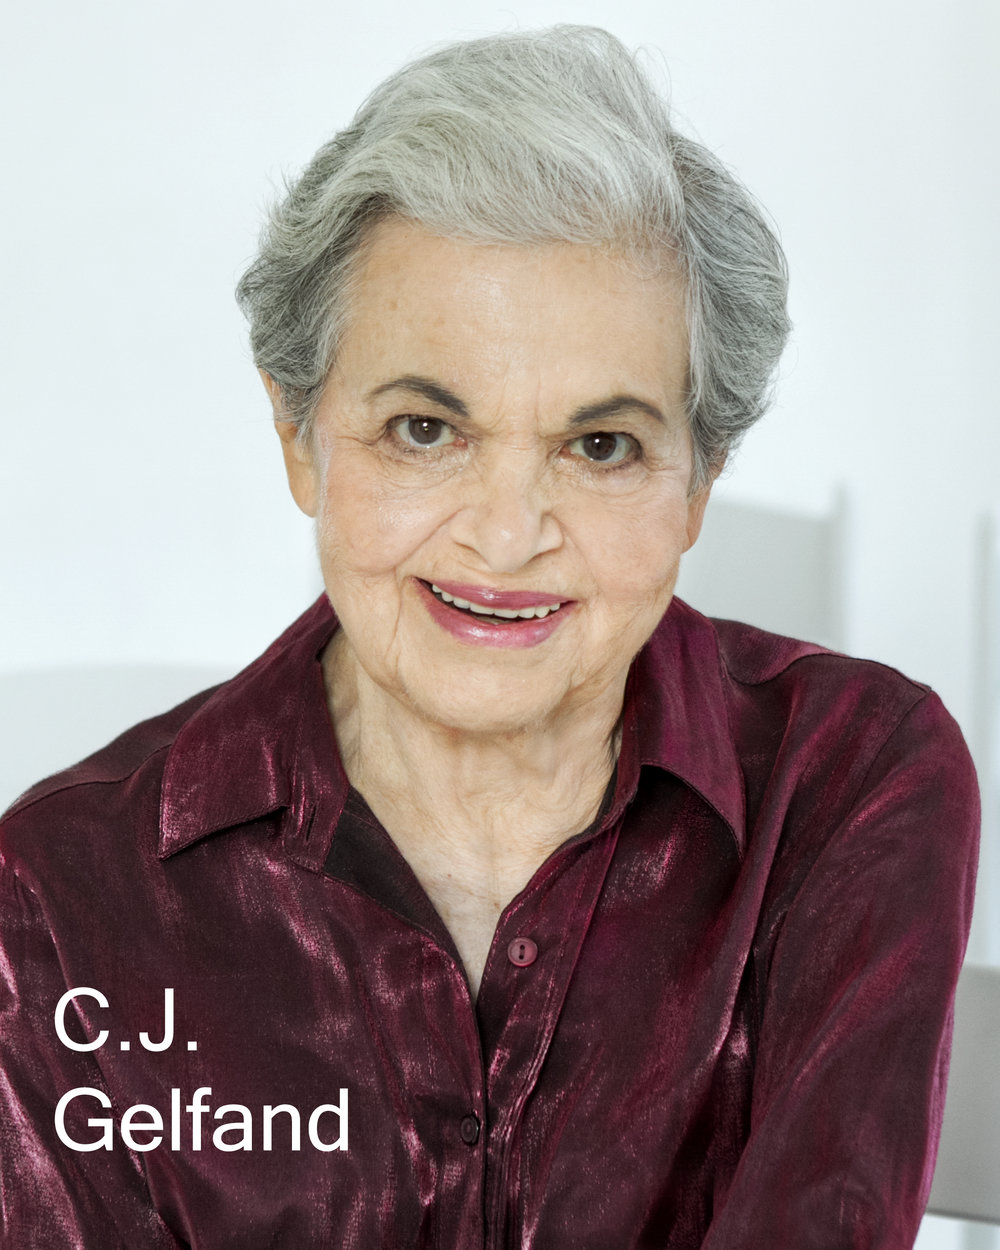 C.J. Gelfand